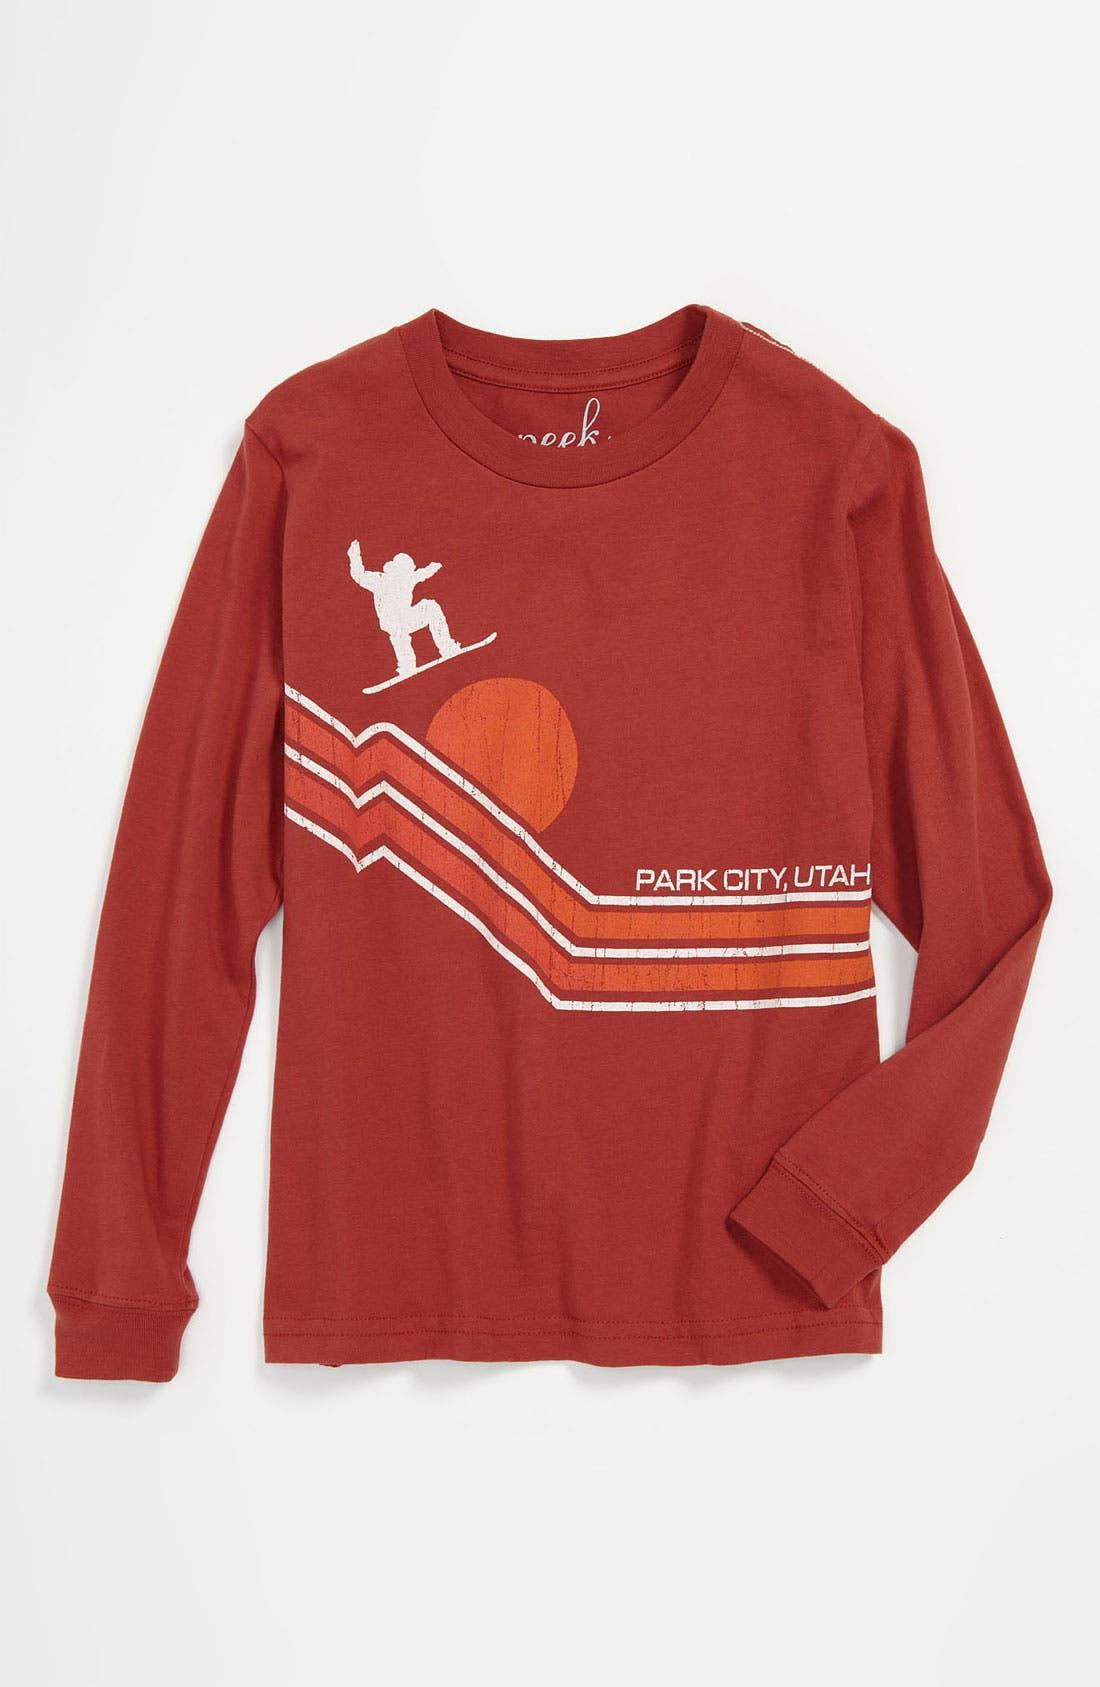 Main Image - Peek 'Park City' T-Shirt (Toddler, Little Boys & Big Boys)